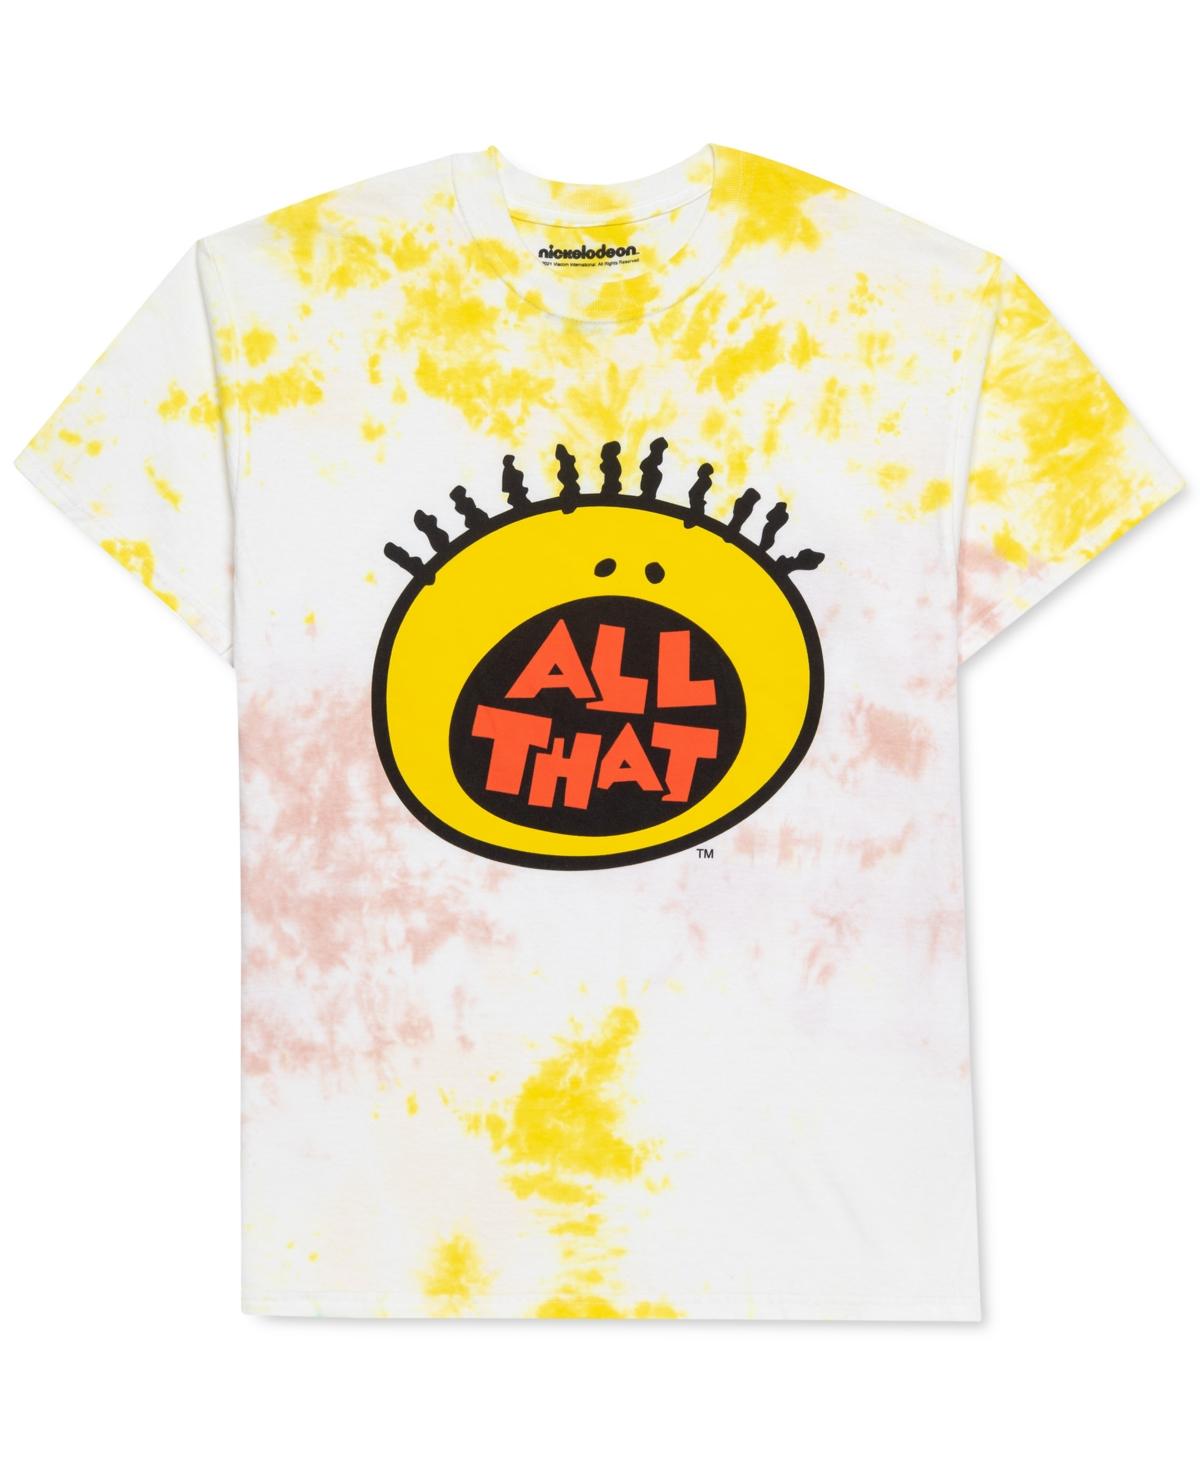 All That Tide Dye Men's Graphic T-Shirt